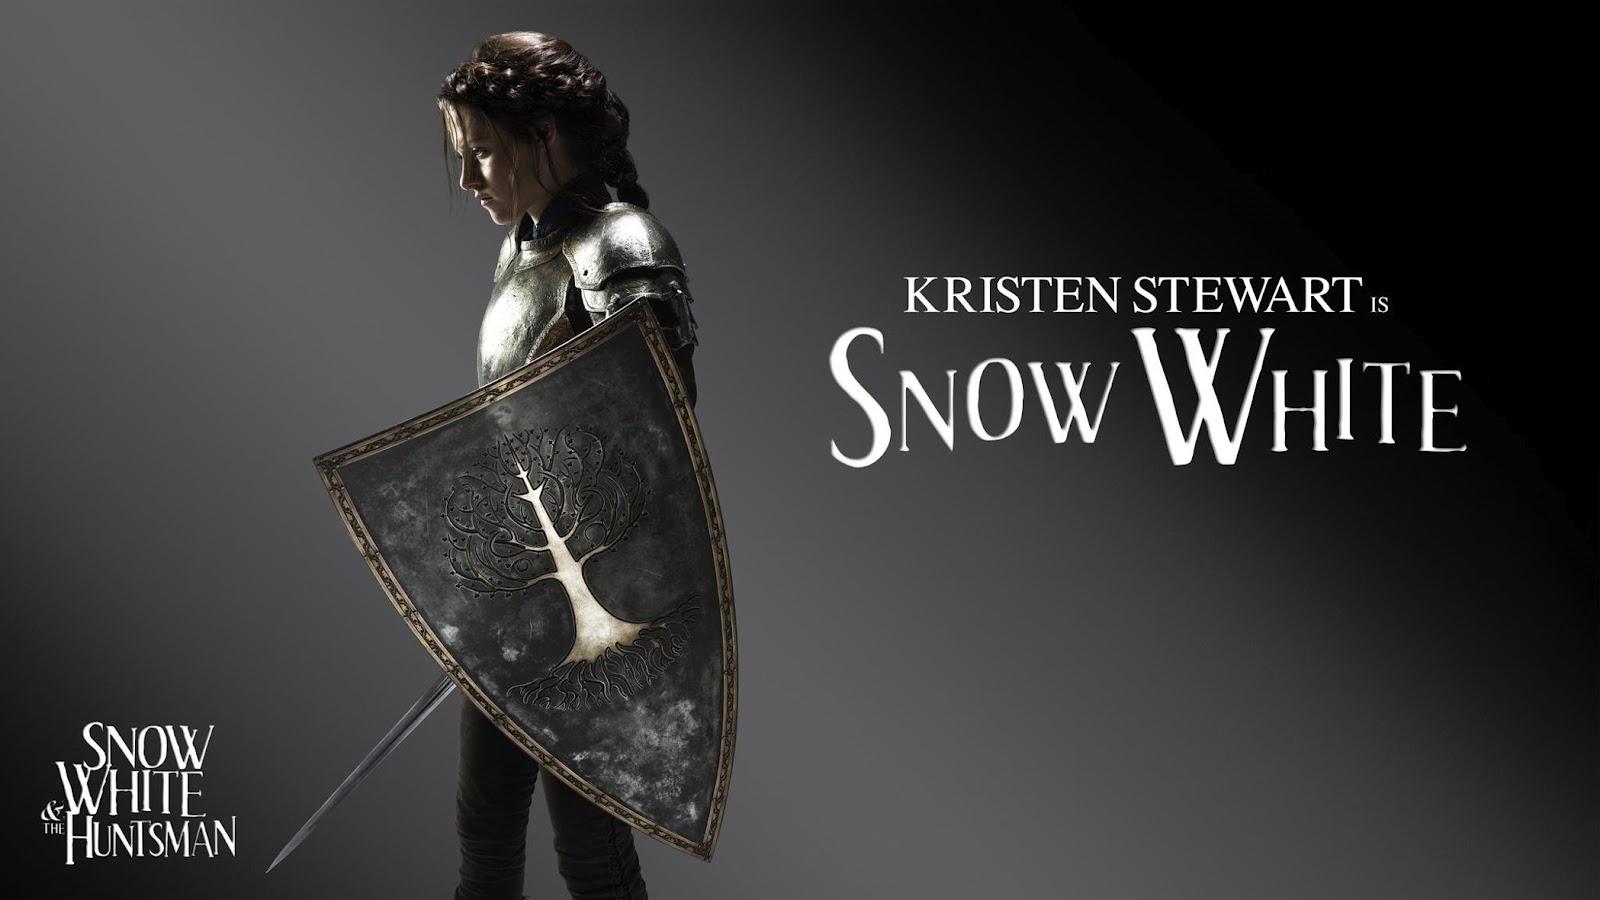 http://2.bp.blogspot.com/-JQvDxfZ_o7k/T0LF6s-9QII/AAAAAAAADC8/pUlQRhPSAp8/s1600/Kristen-Stewart-is-Snow-White.jpg